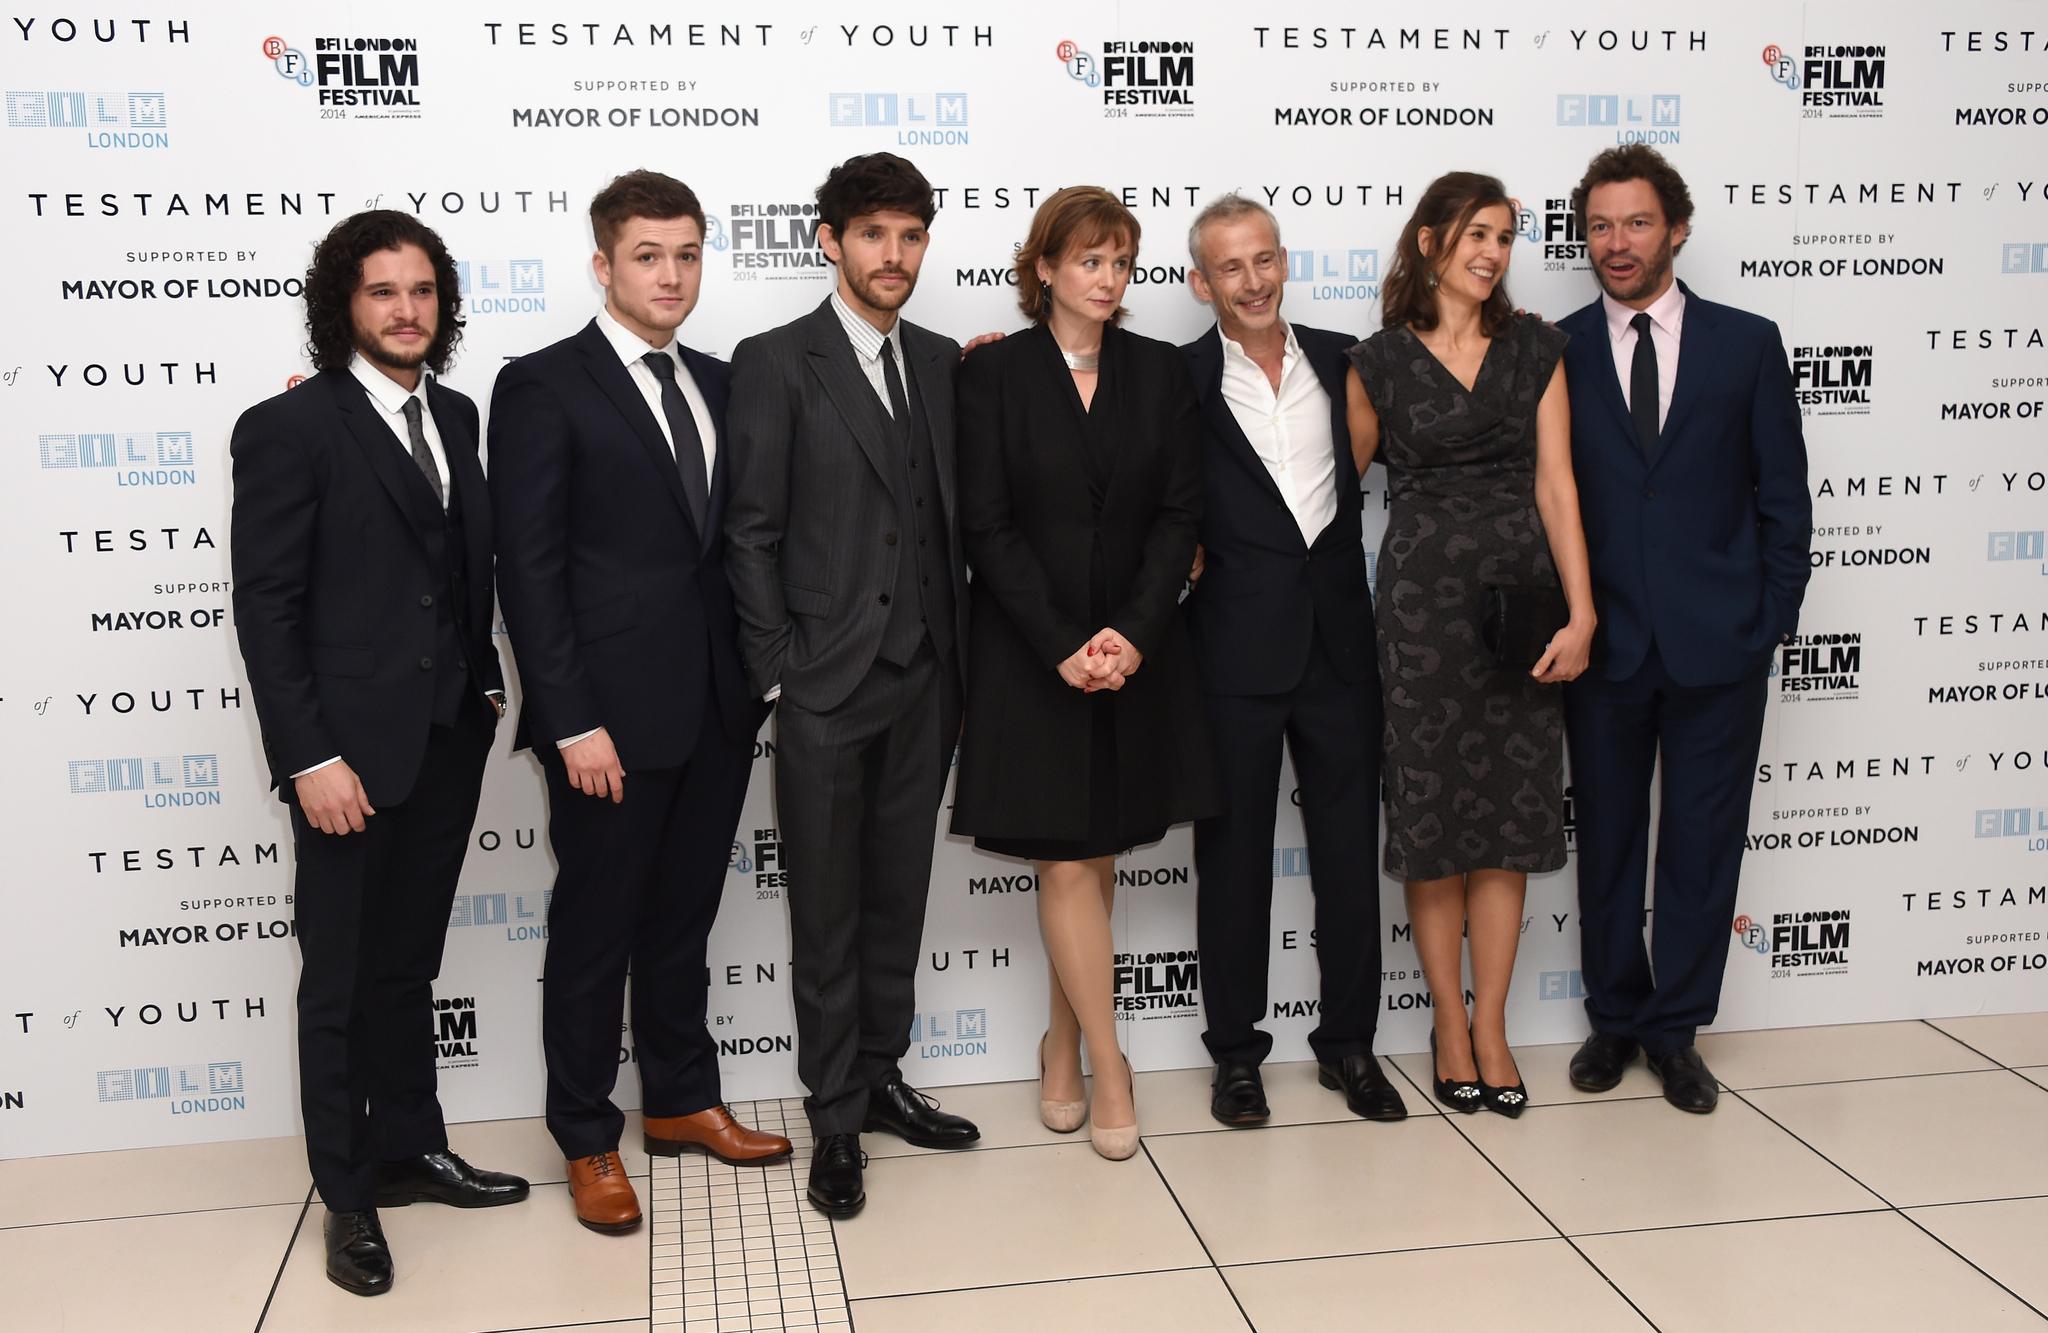 Emily Watson, James Kent, Dominic West, Juliette Towhidi, Colin Morgan, Kit Harington and Taron Egerton at event of Jaunystes pazadas (2014)